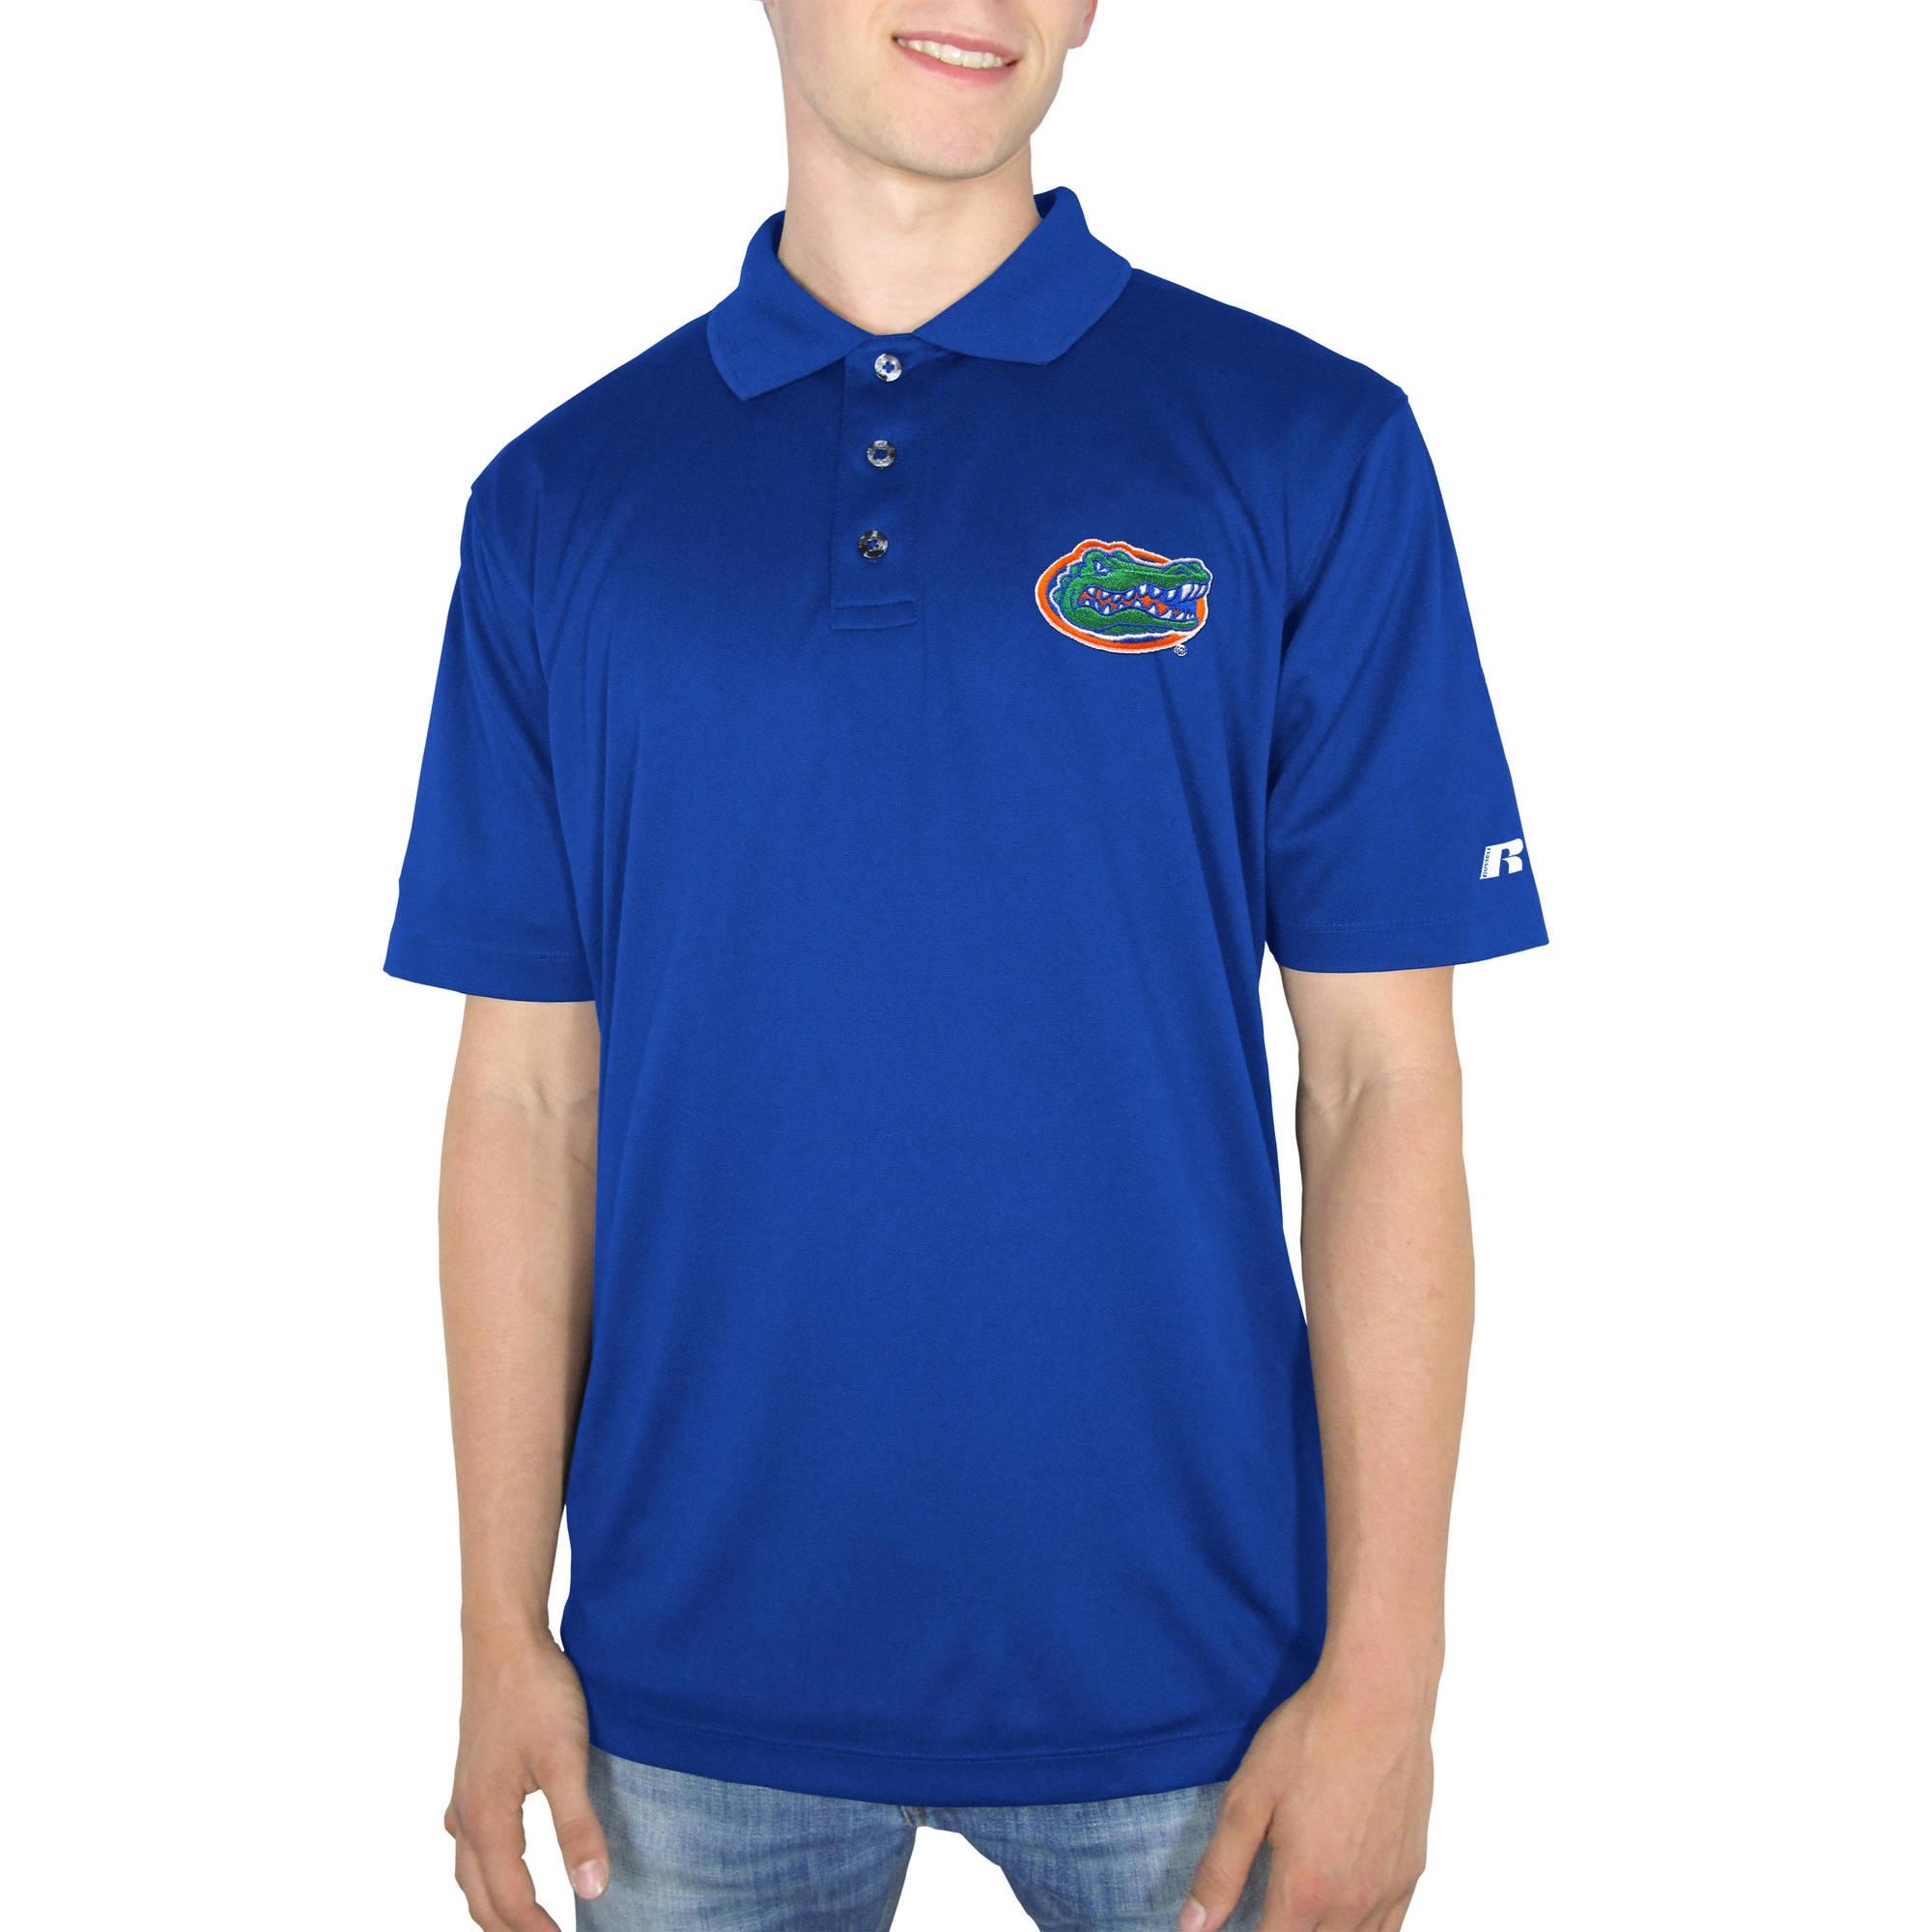 Russell NCAA Florida Gators  Men's Synthetic Polo